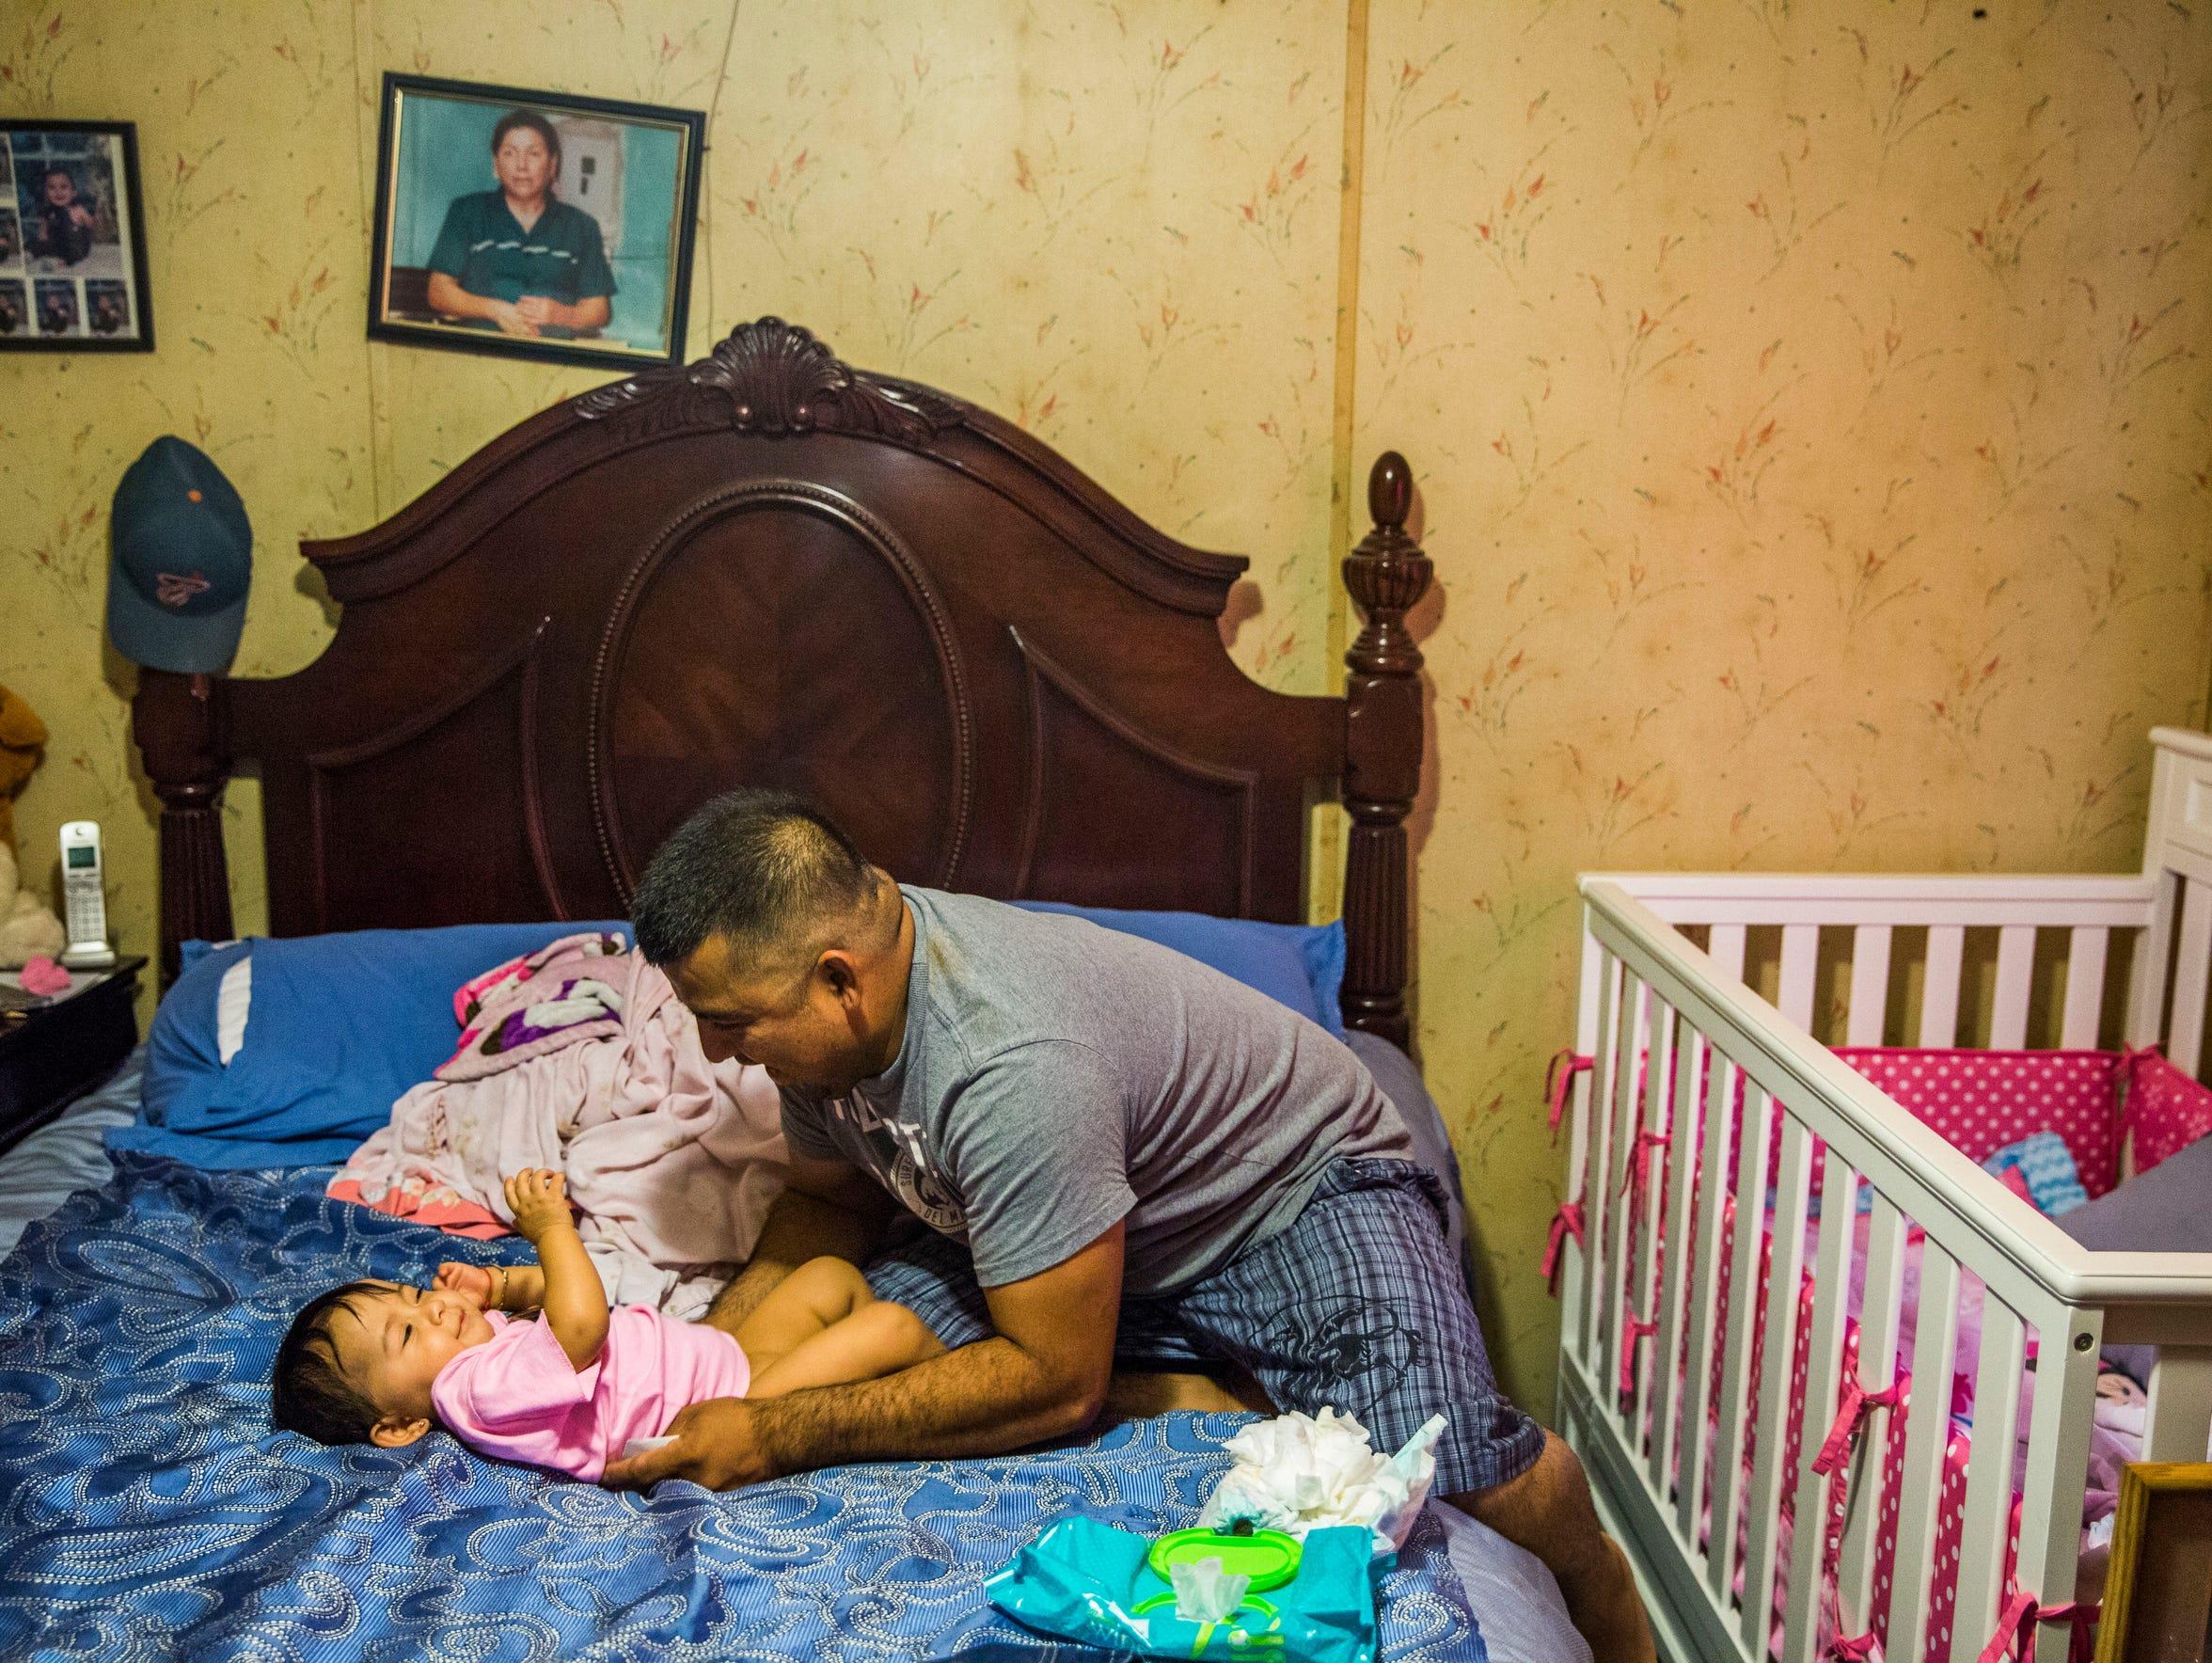 Abednego de la Cruz plays with his daughter Jazlyn,